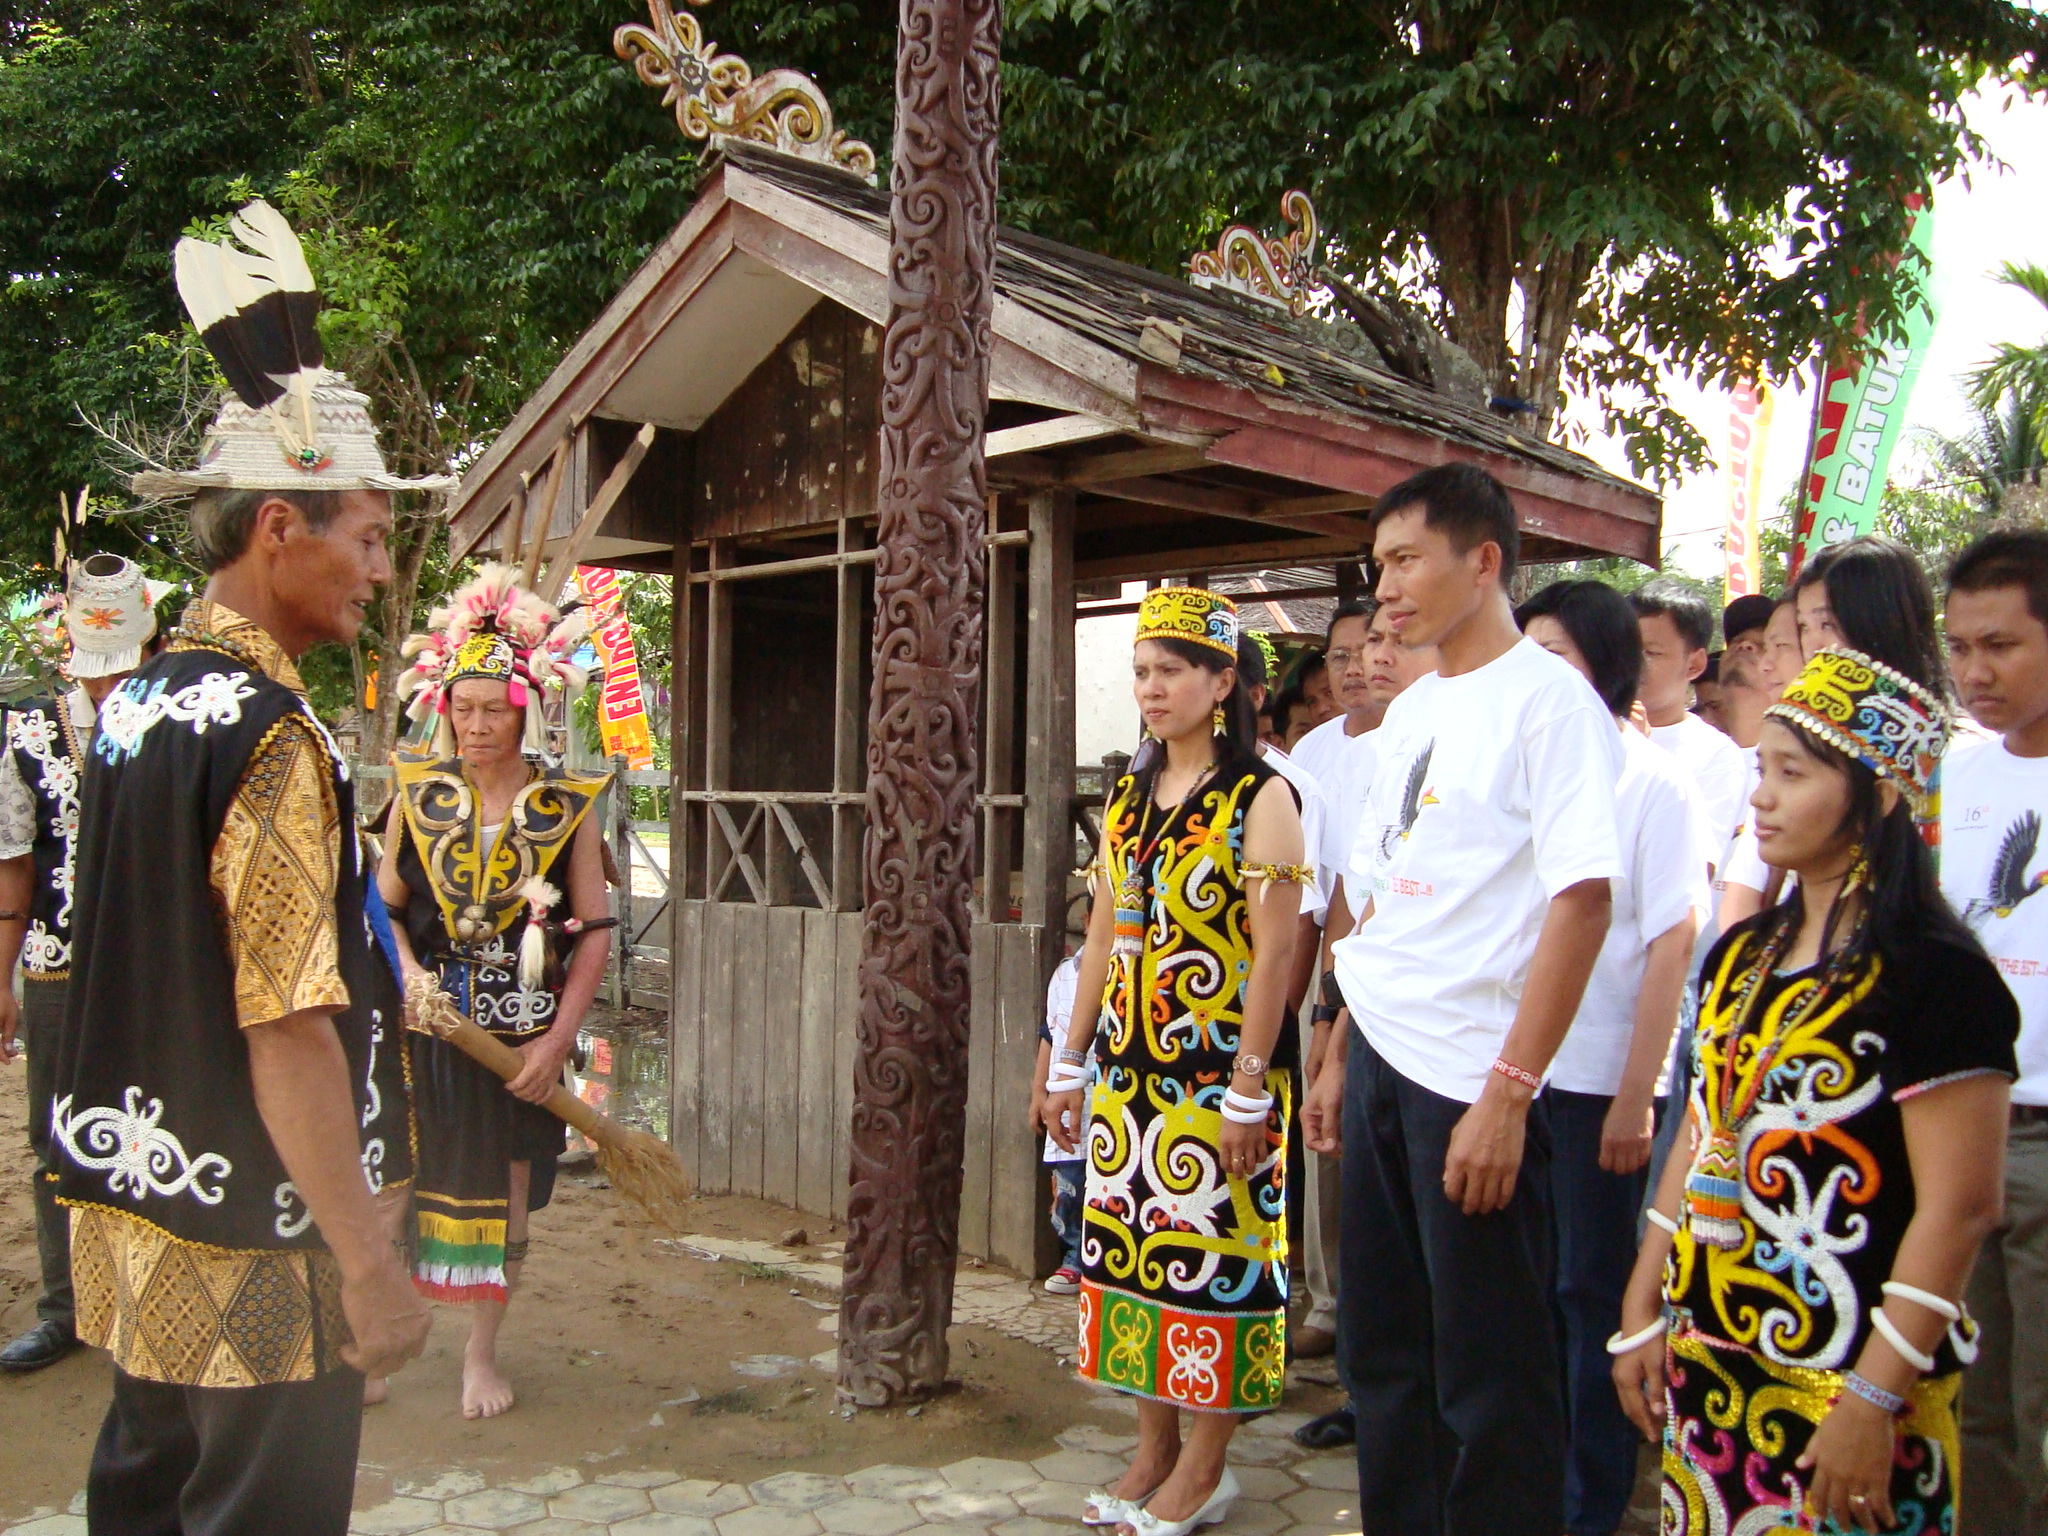 Sejarah Pampang Suni Aso Enseval Desa Budaya Kota Samarinda